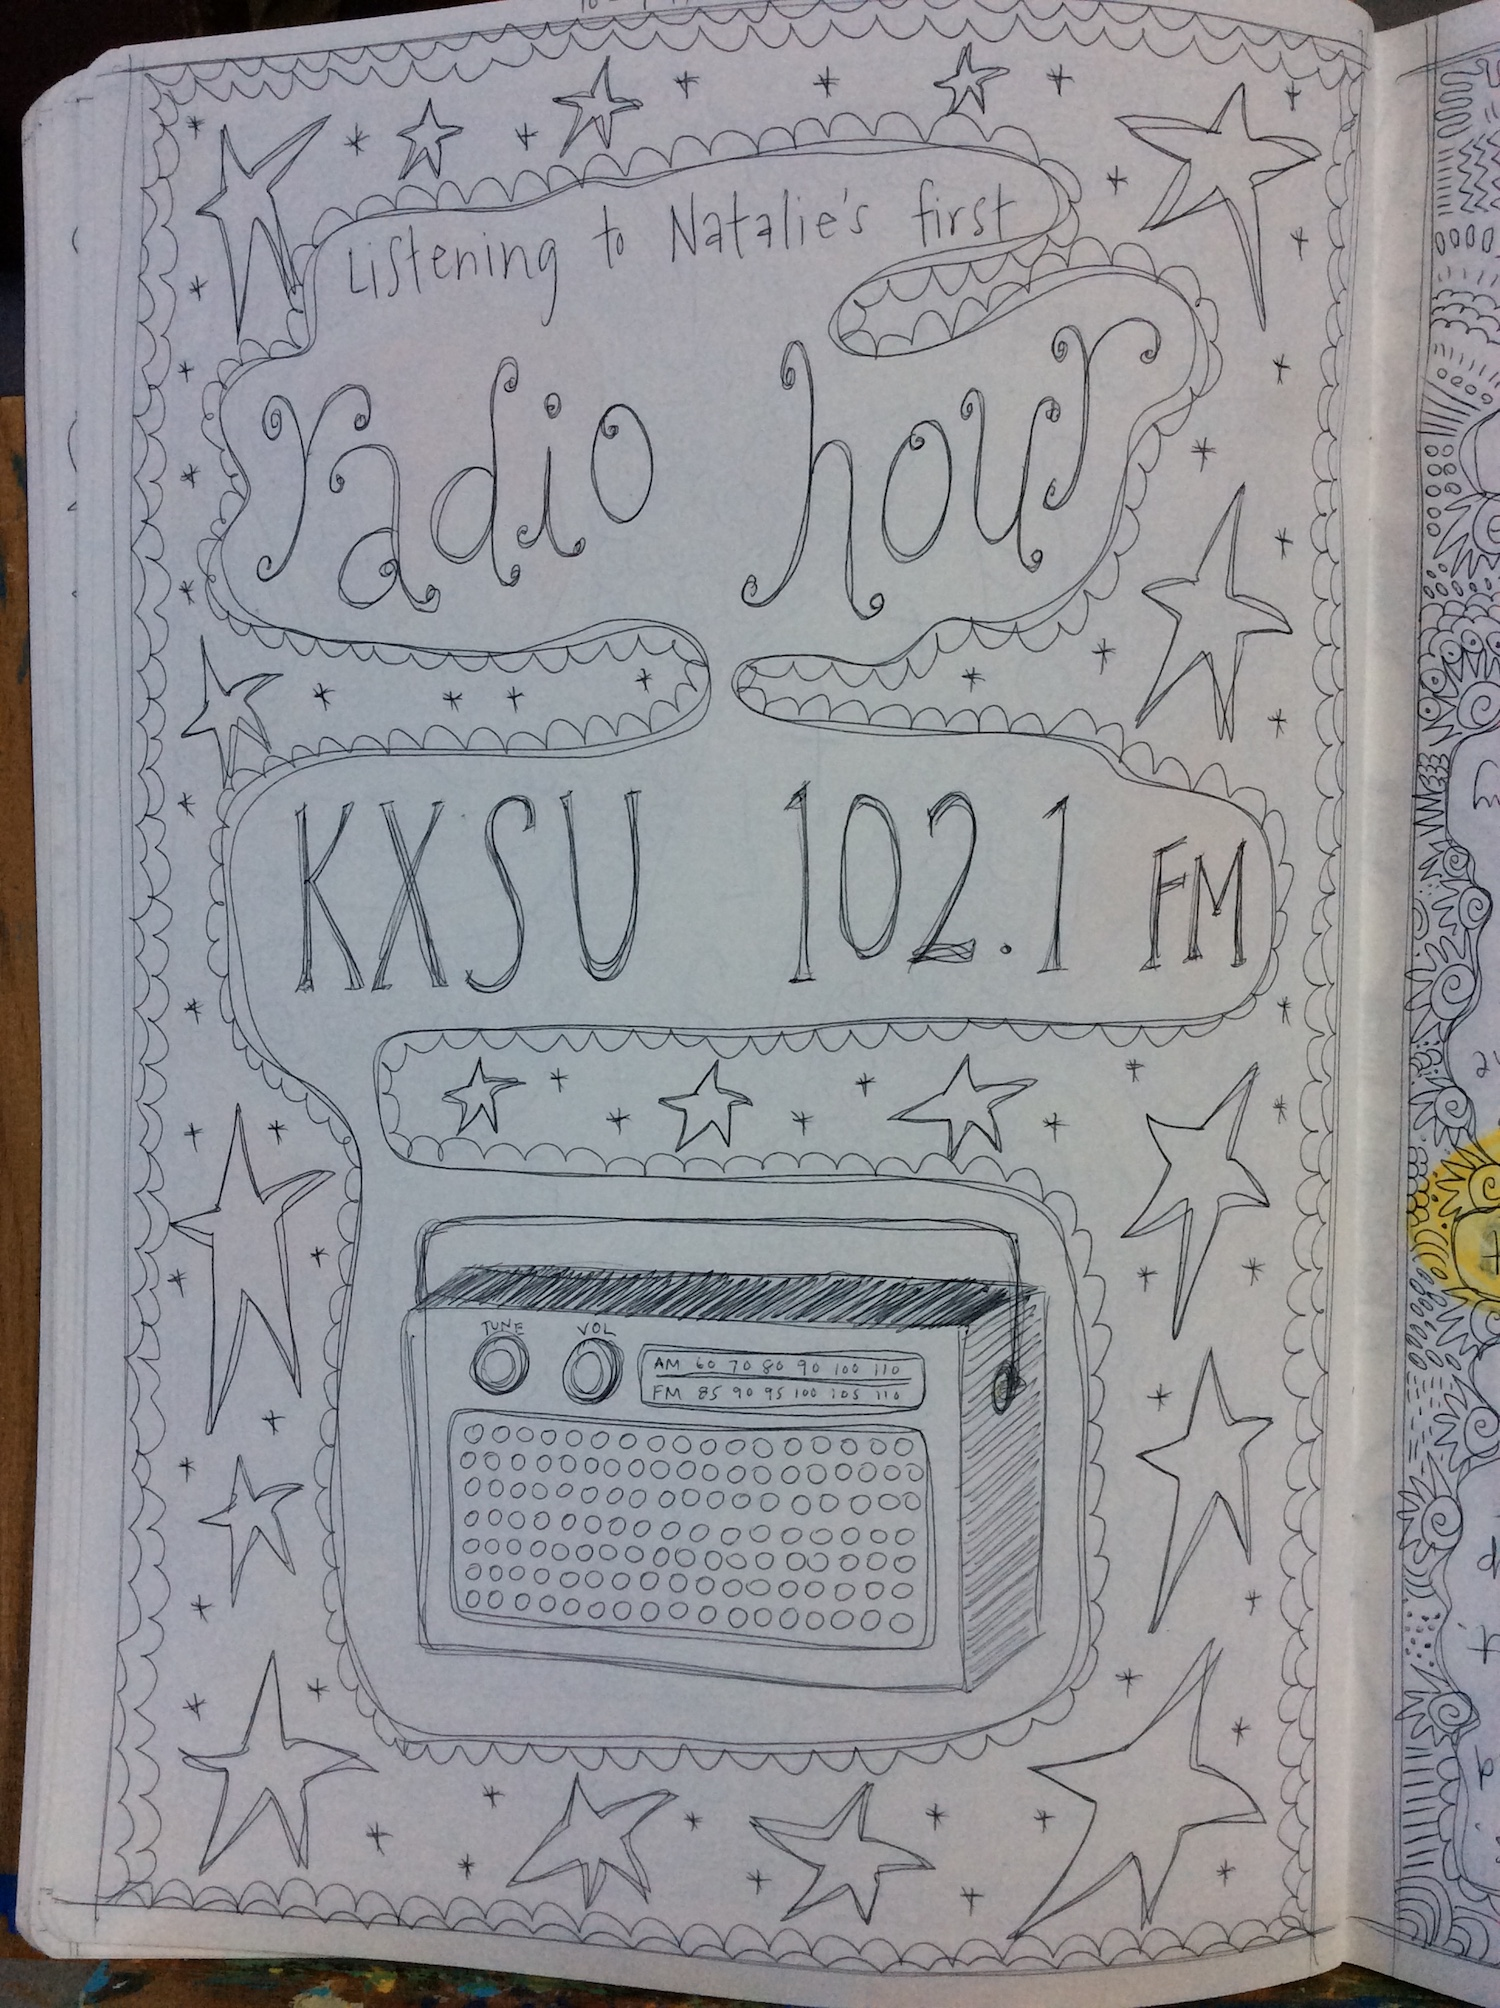 Nats on the radio.JPG